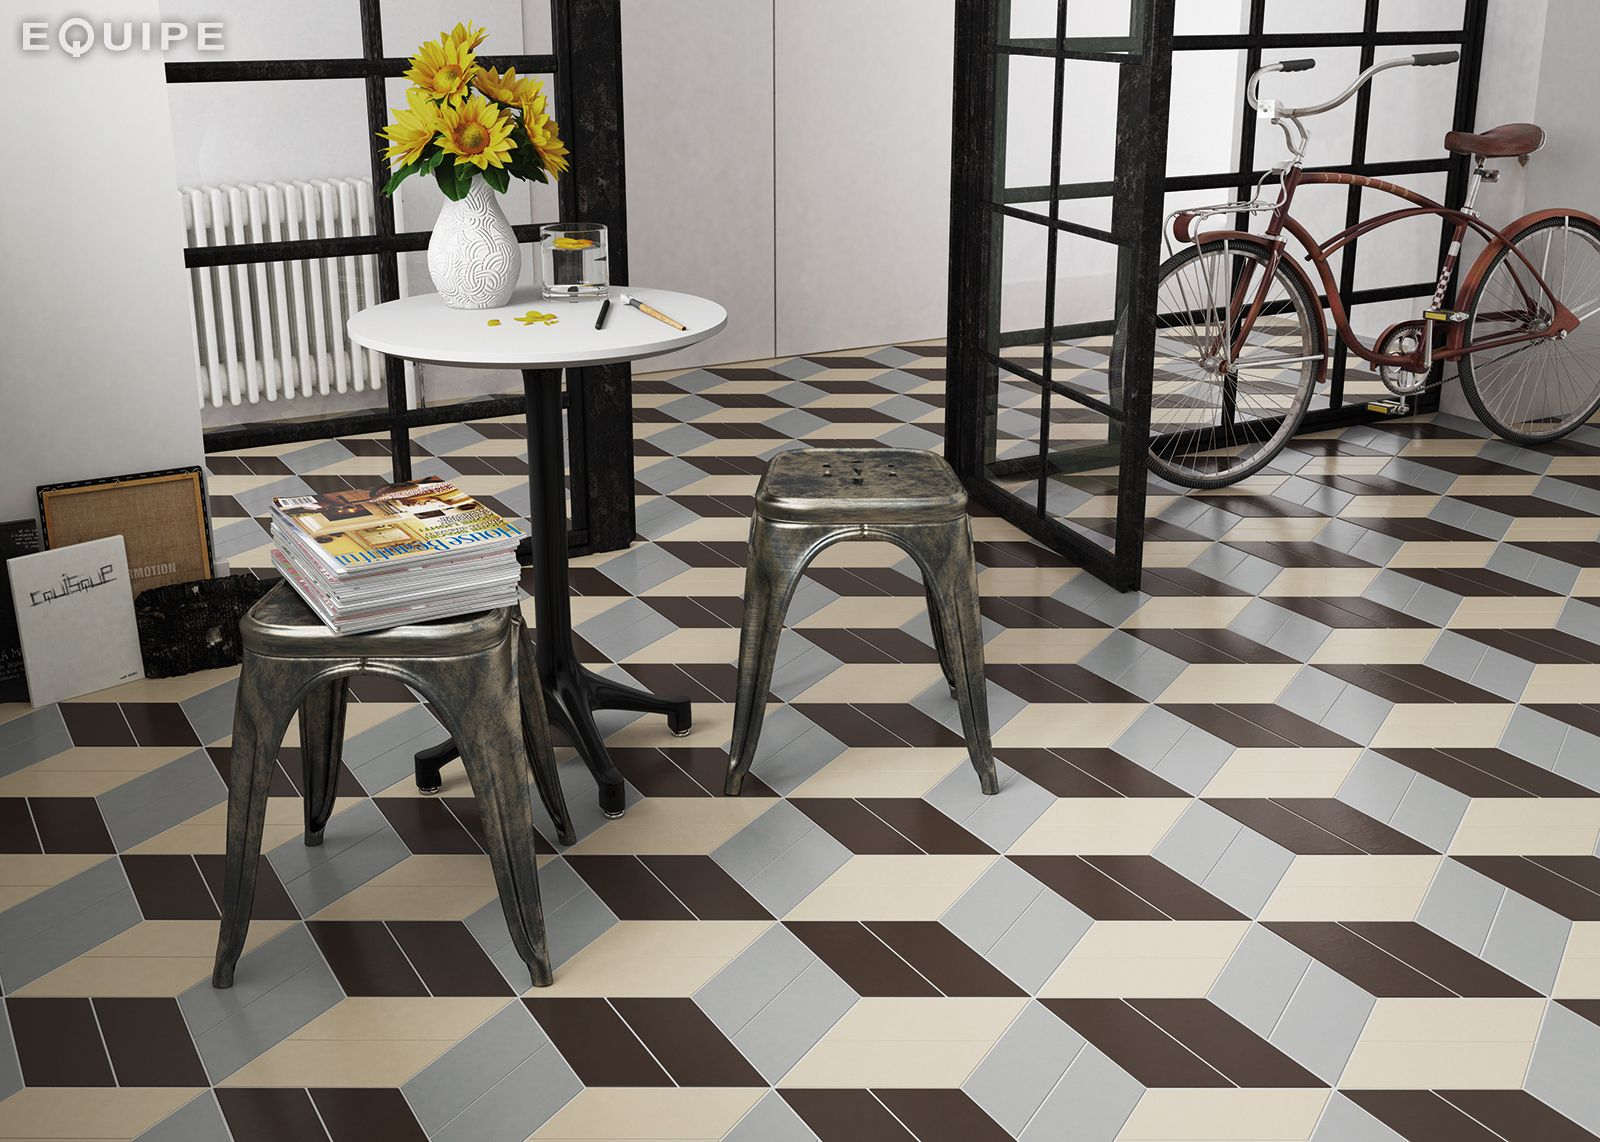 Chevron gris crema marrn left 9x205 chevron wall floor chevron wall floor tiles ceramic basic color ceramic tile porcelain tile contemporary modern form geometric interior design dailygadgetfo Choice Image